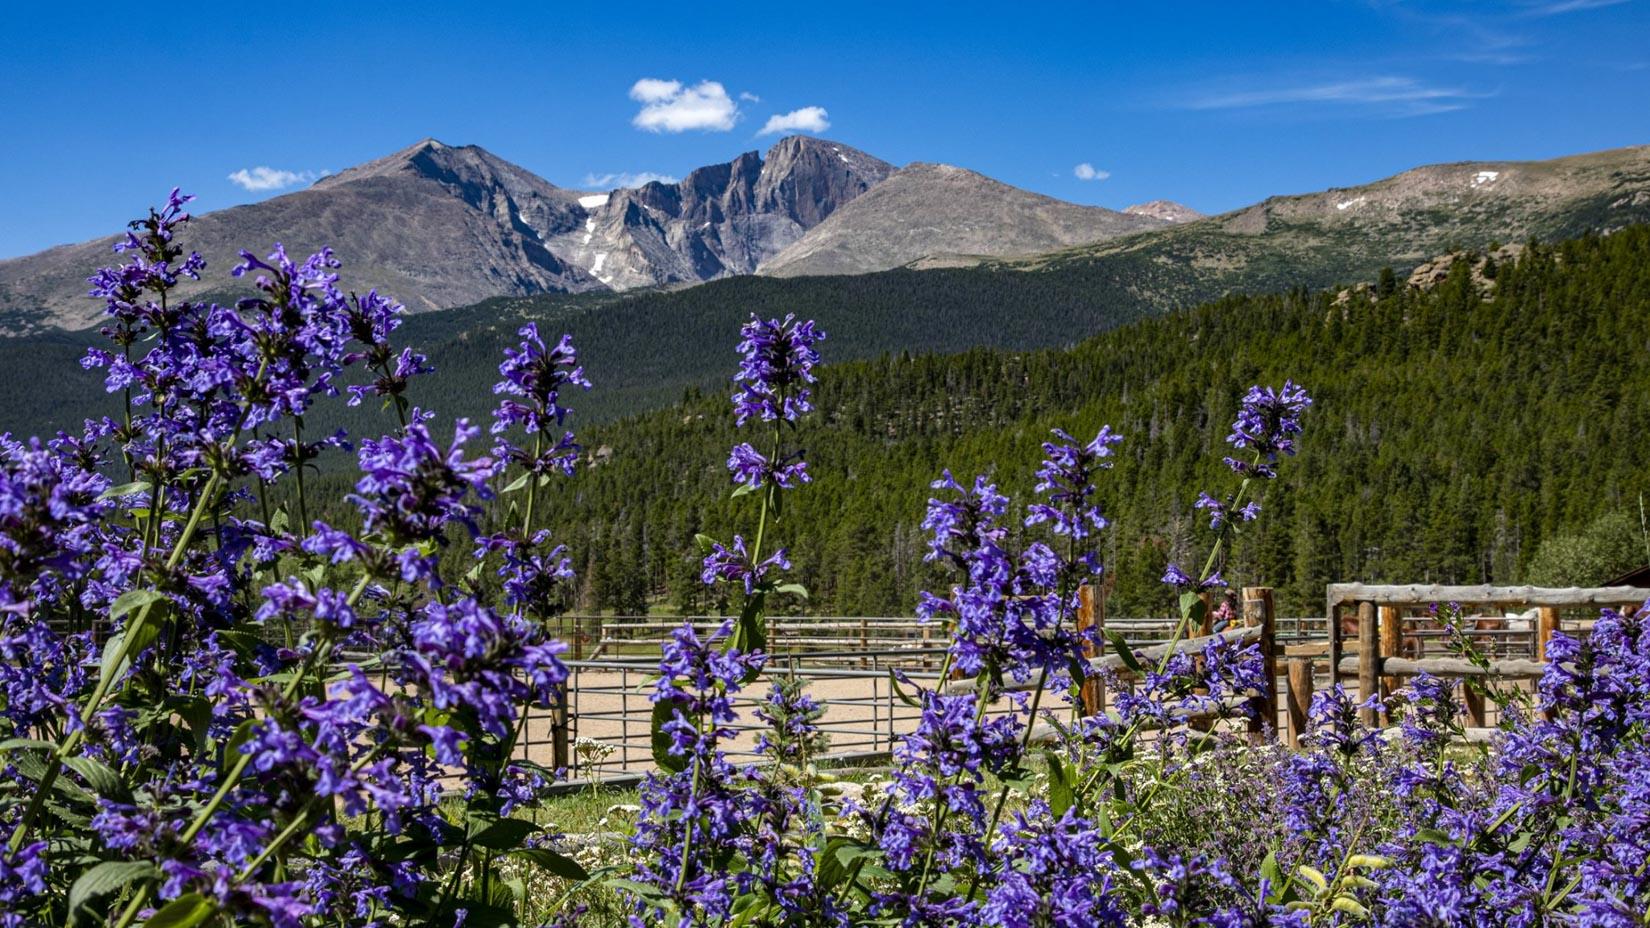 Bright purple flowers and a mountainous landscape.